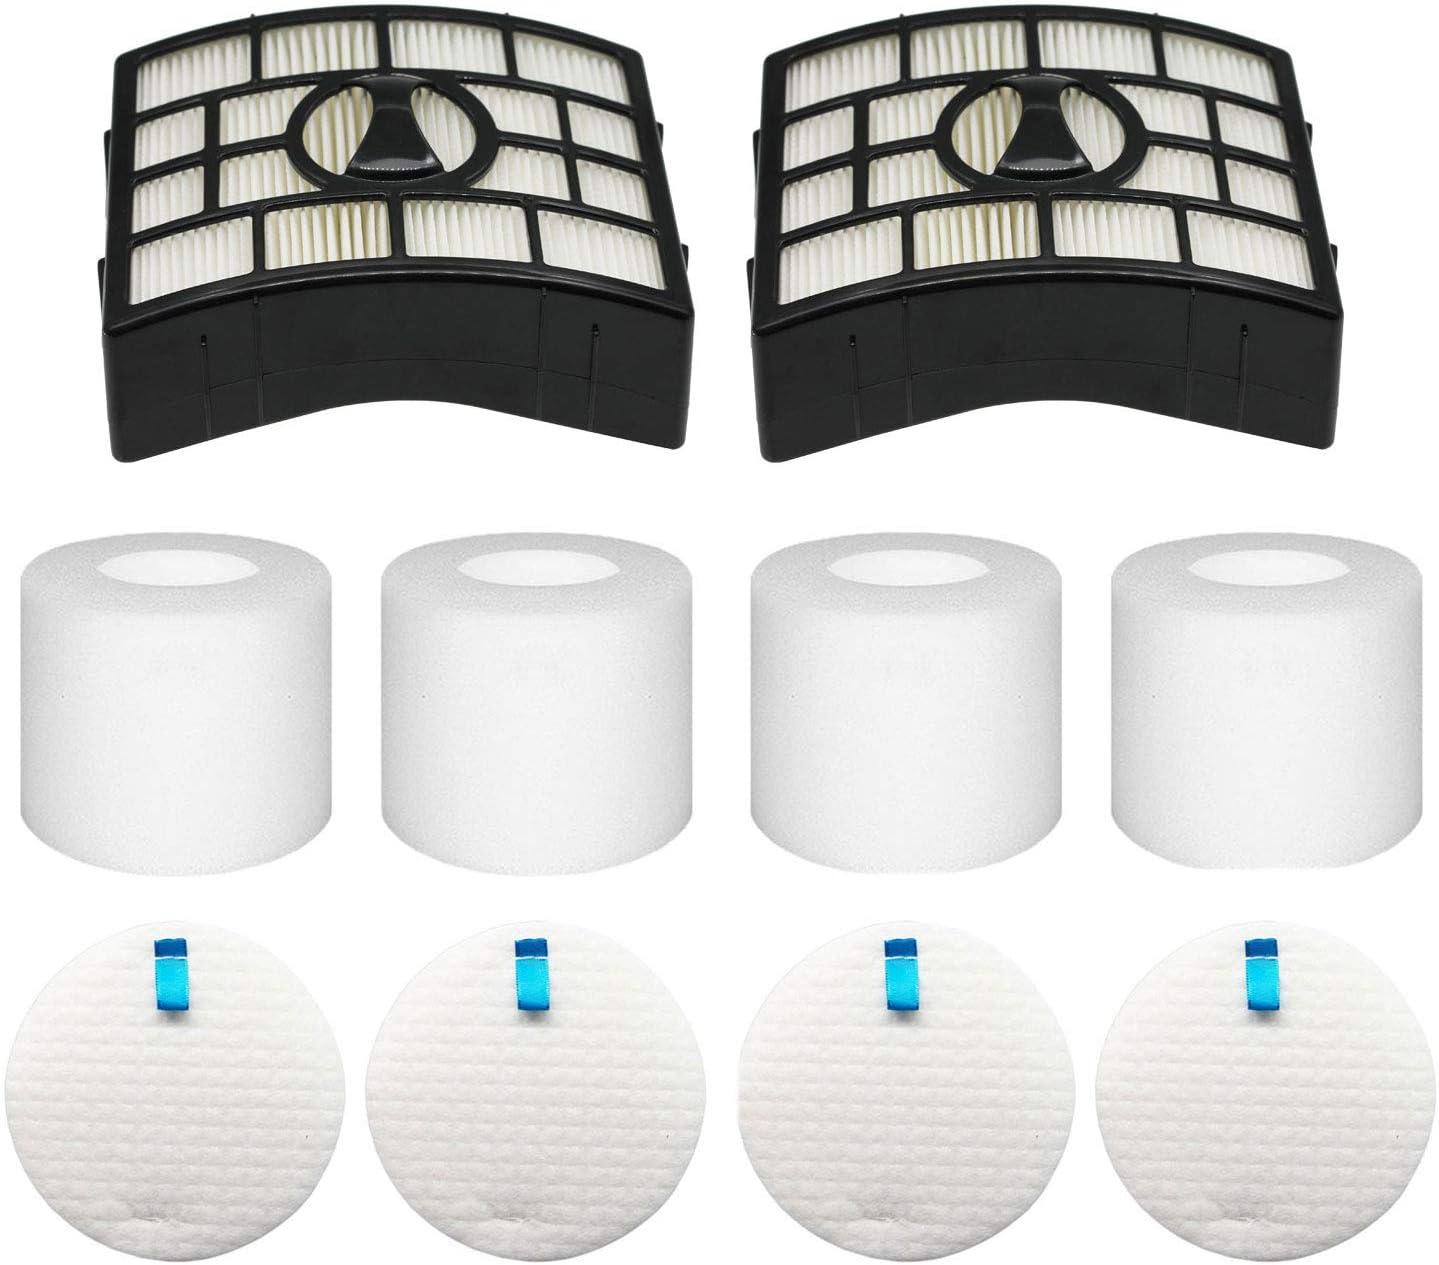 Colorfullife NV650 NV750 Filters for Shark Rotator Powered Lift-Away Vacuum NV650, NV650W, NV651, NV652, NV750, NV750W, NV751, NV752, 4 Foam & Felt + 2 Hepa Filters, Replaces Part XFF650 & XHF650